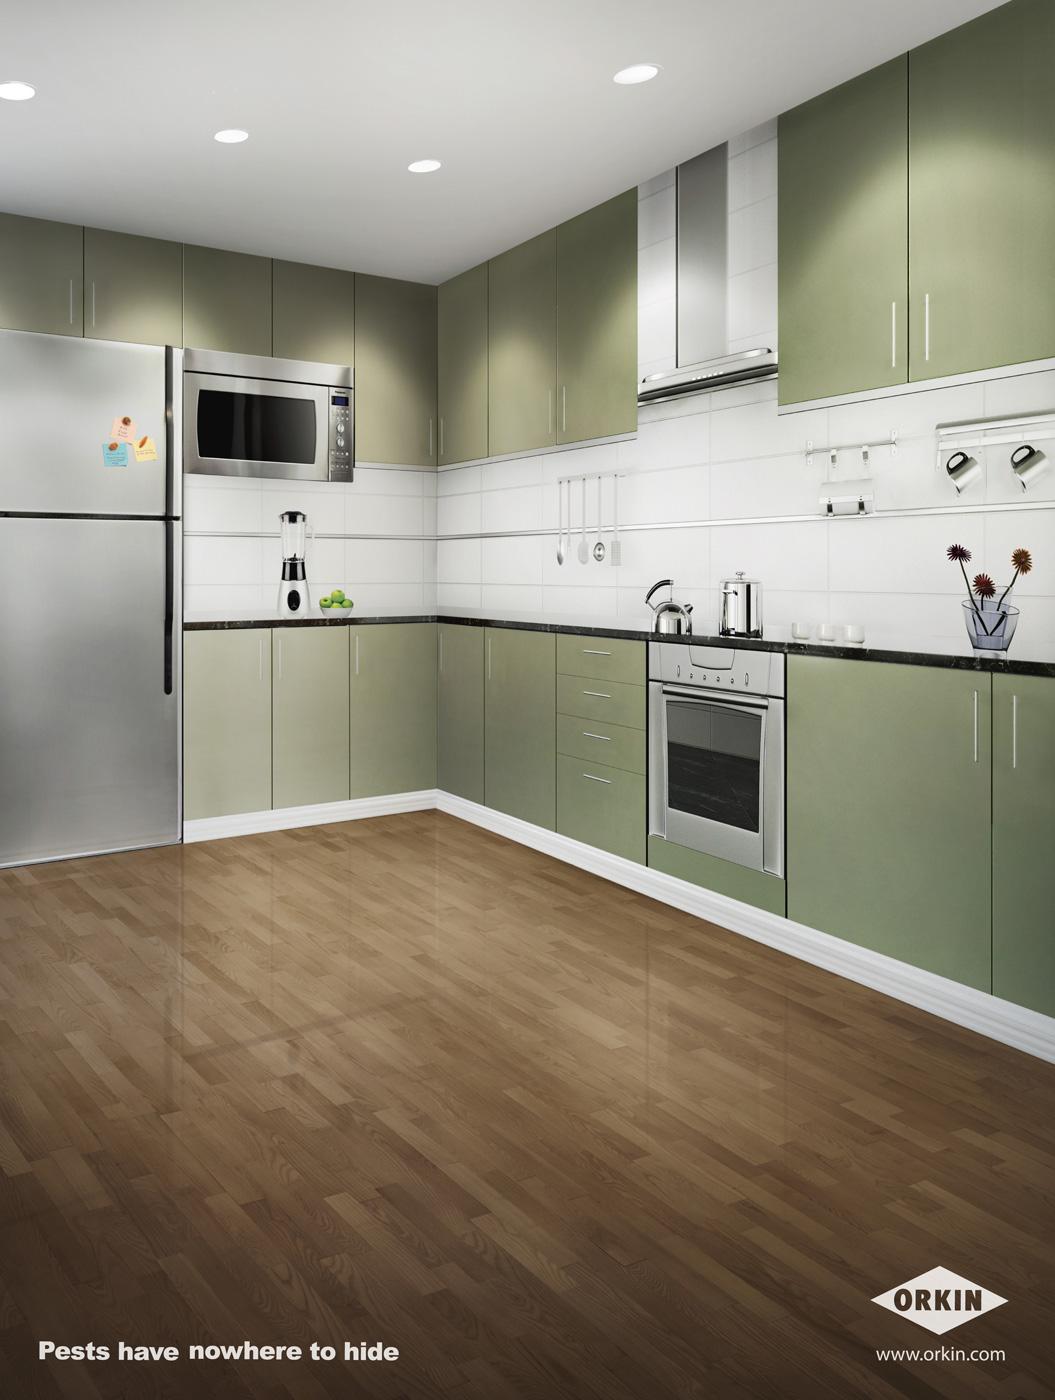 Orkin Pests Control: Kitchen - adsofbrands net